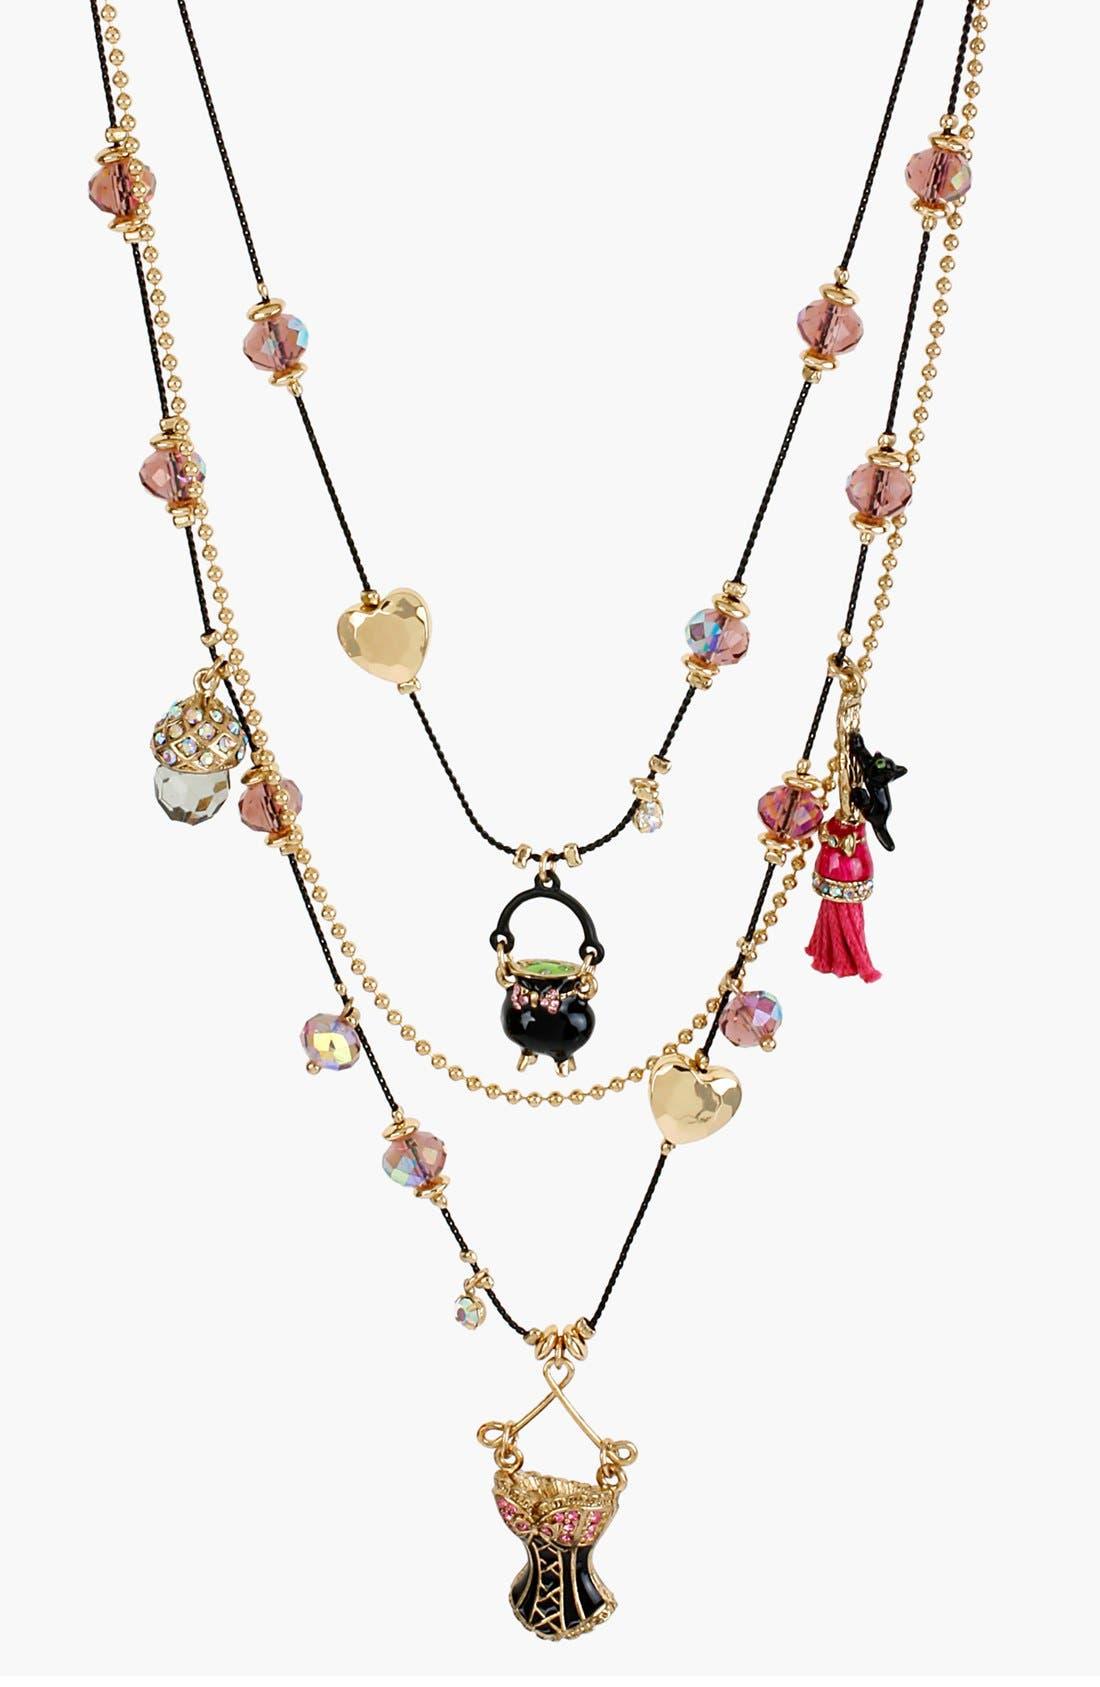 Main Image - Betsey Johnson 'Enchanted Forest' Multistrand Necklace